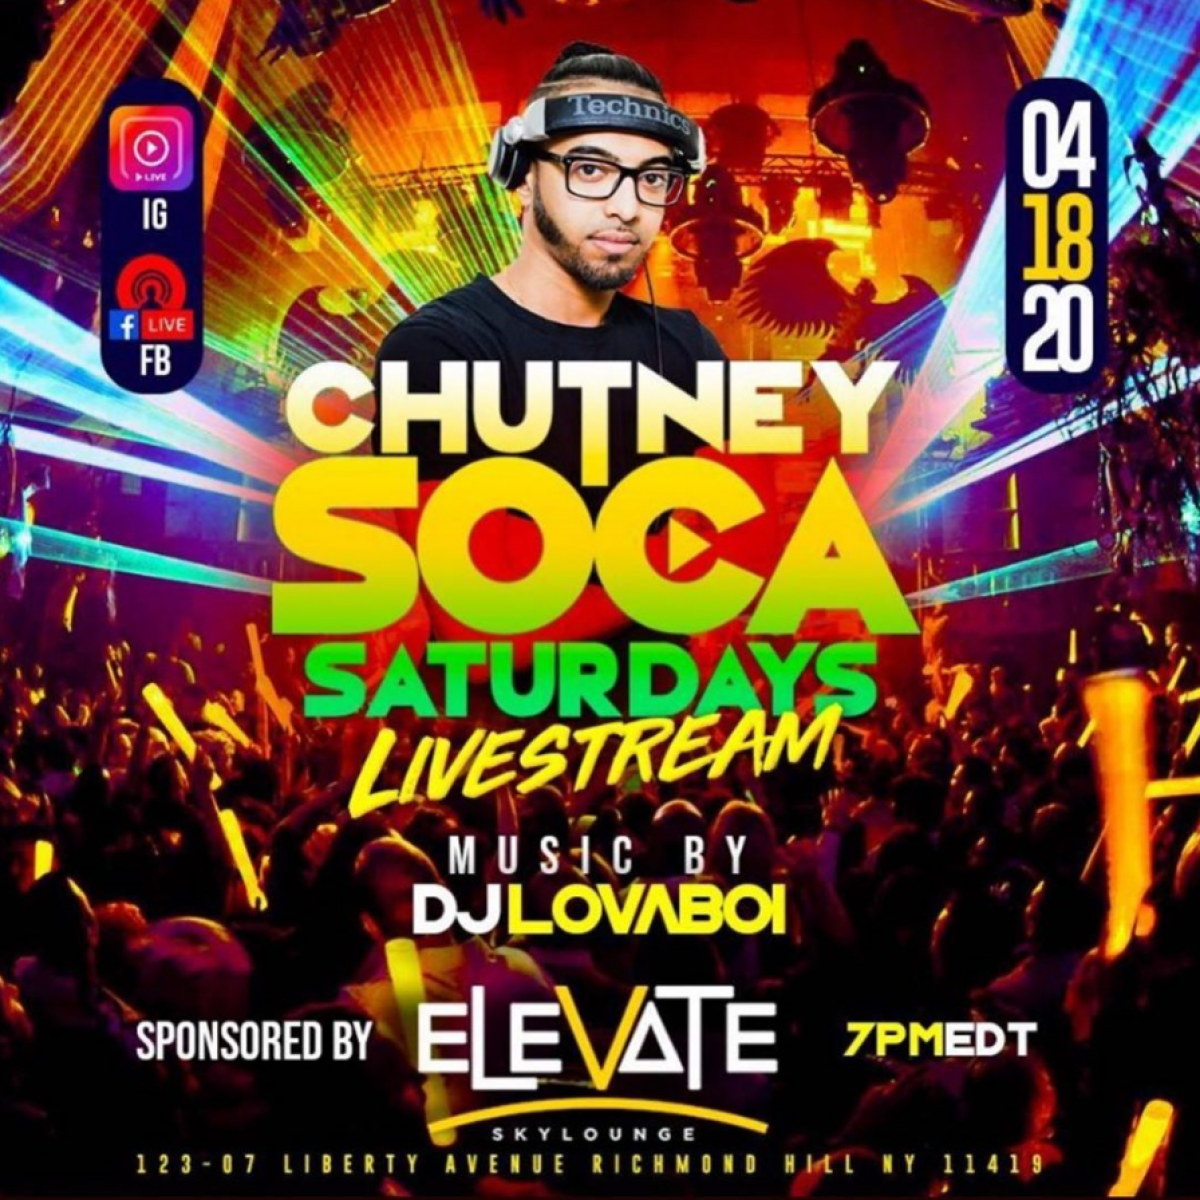 Chutney Soca Saturdays Live Stream flyer or graphic.